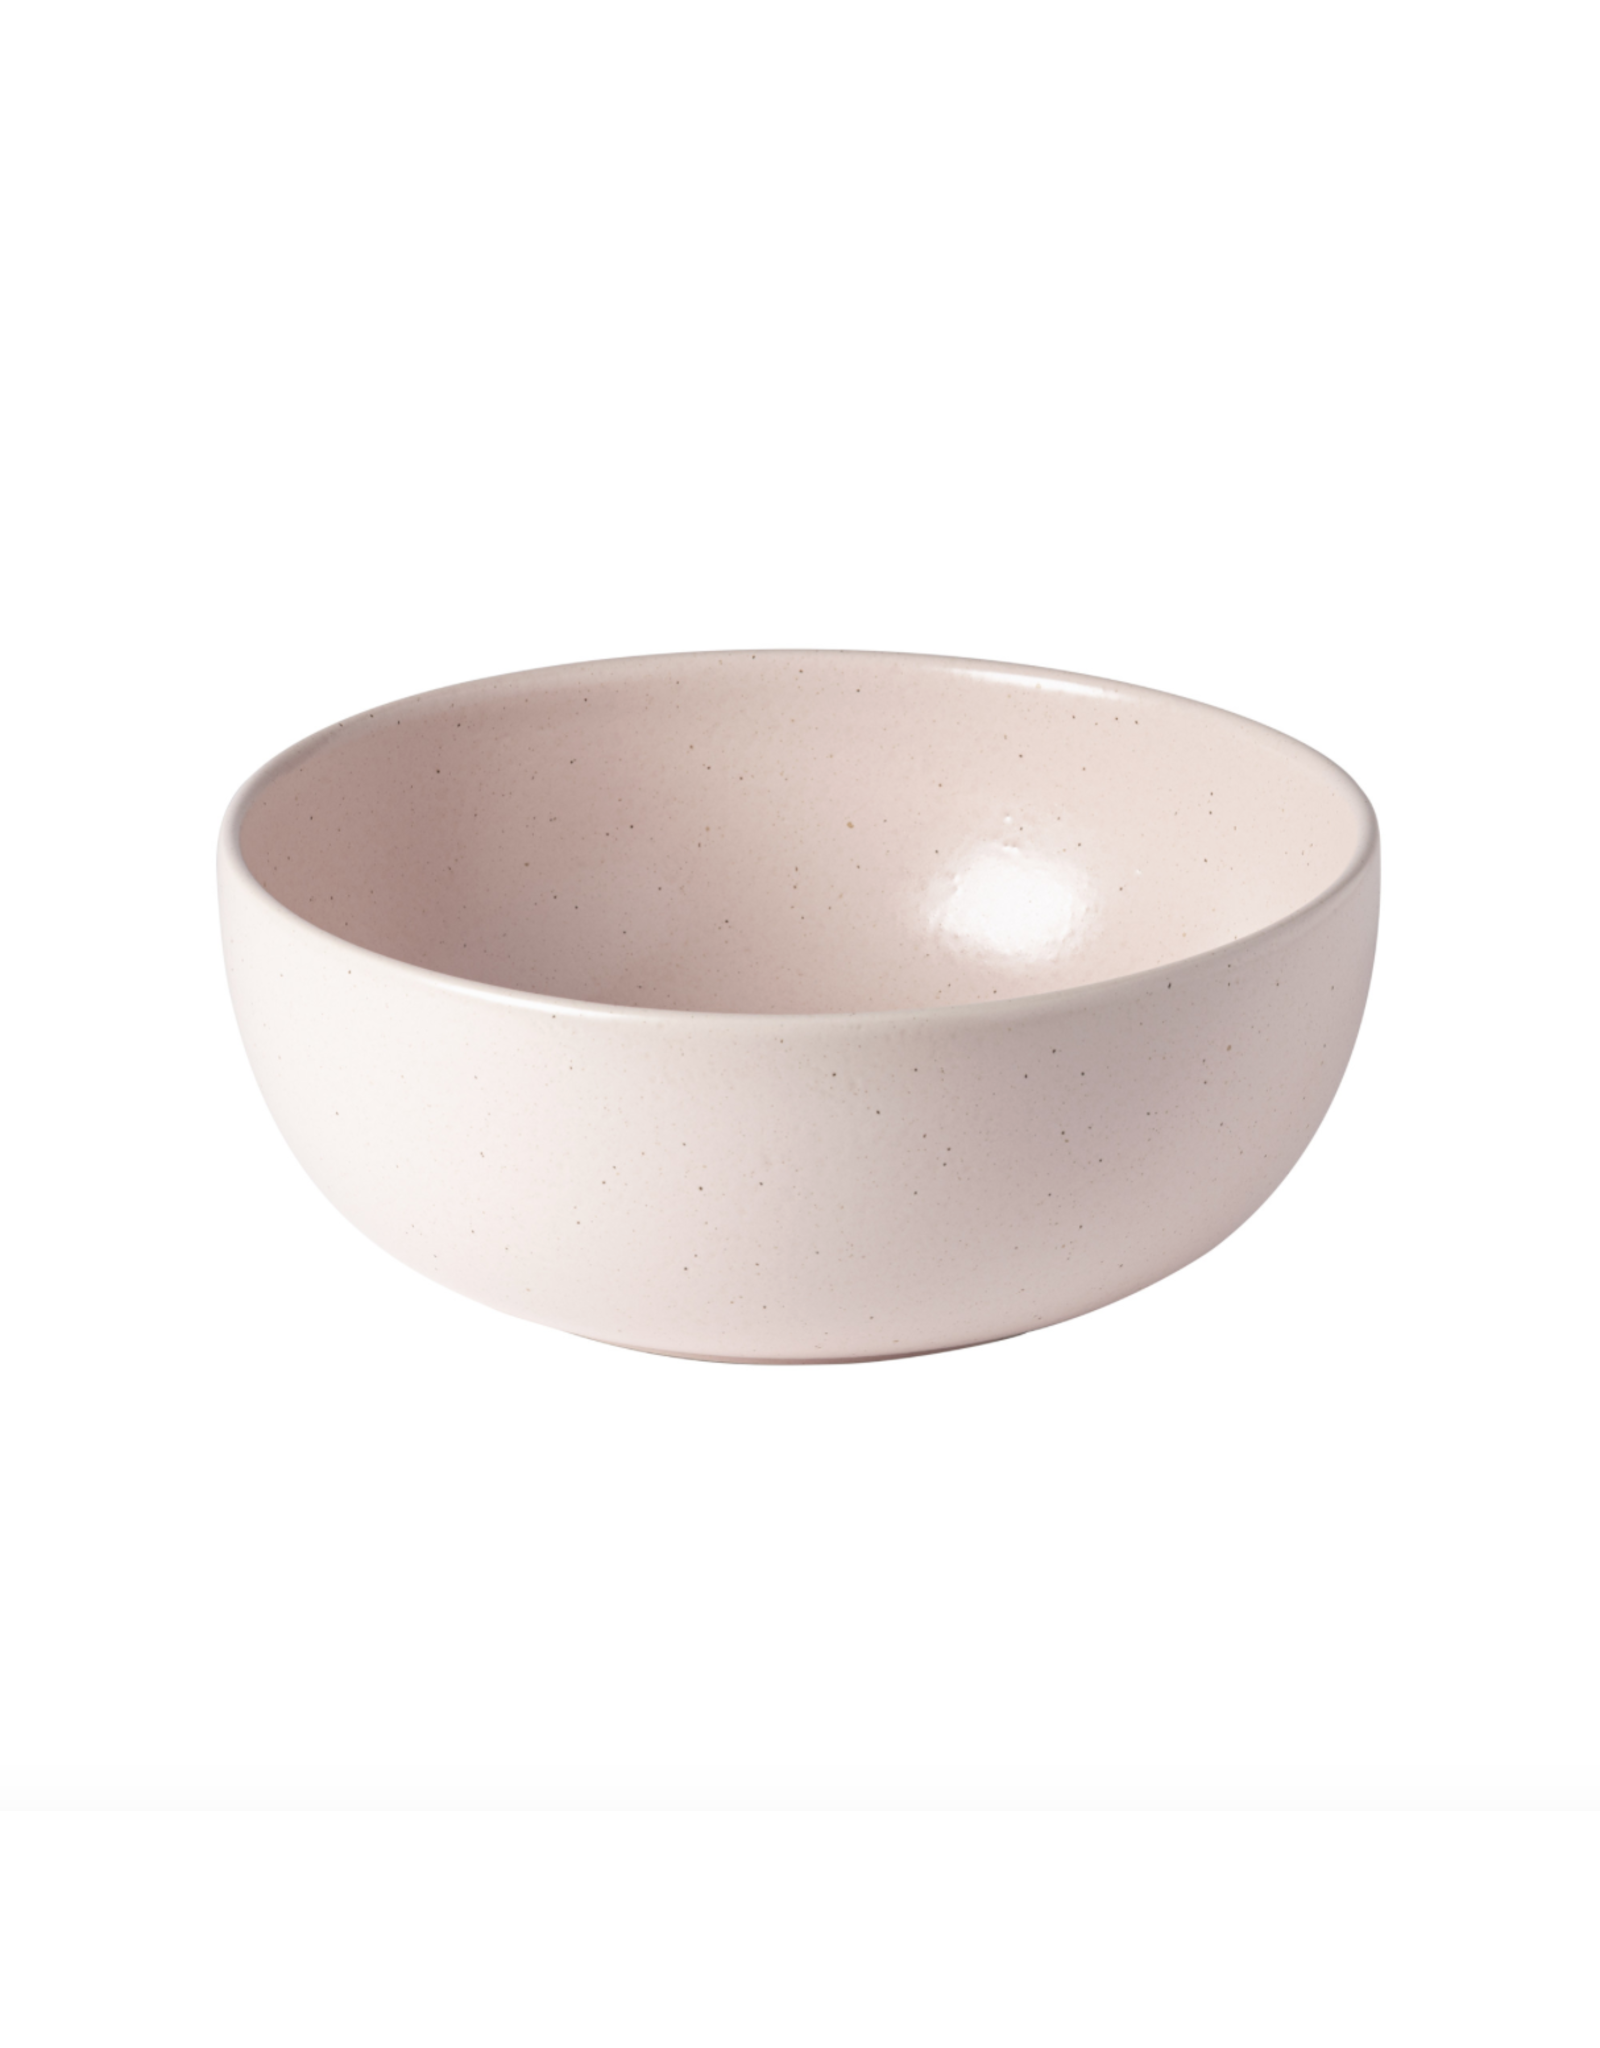 Kitchen Trend Slaschaal 25cm Pacifica roze